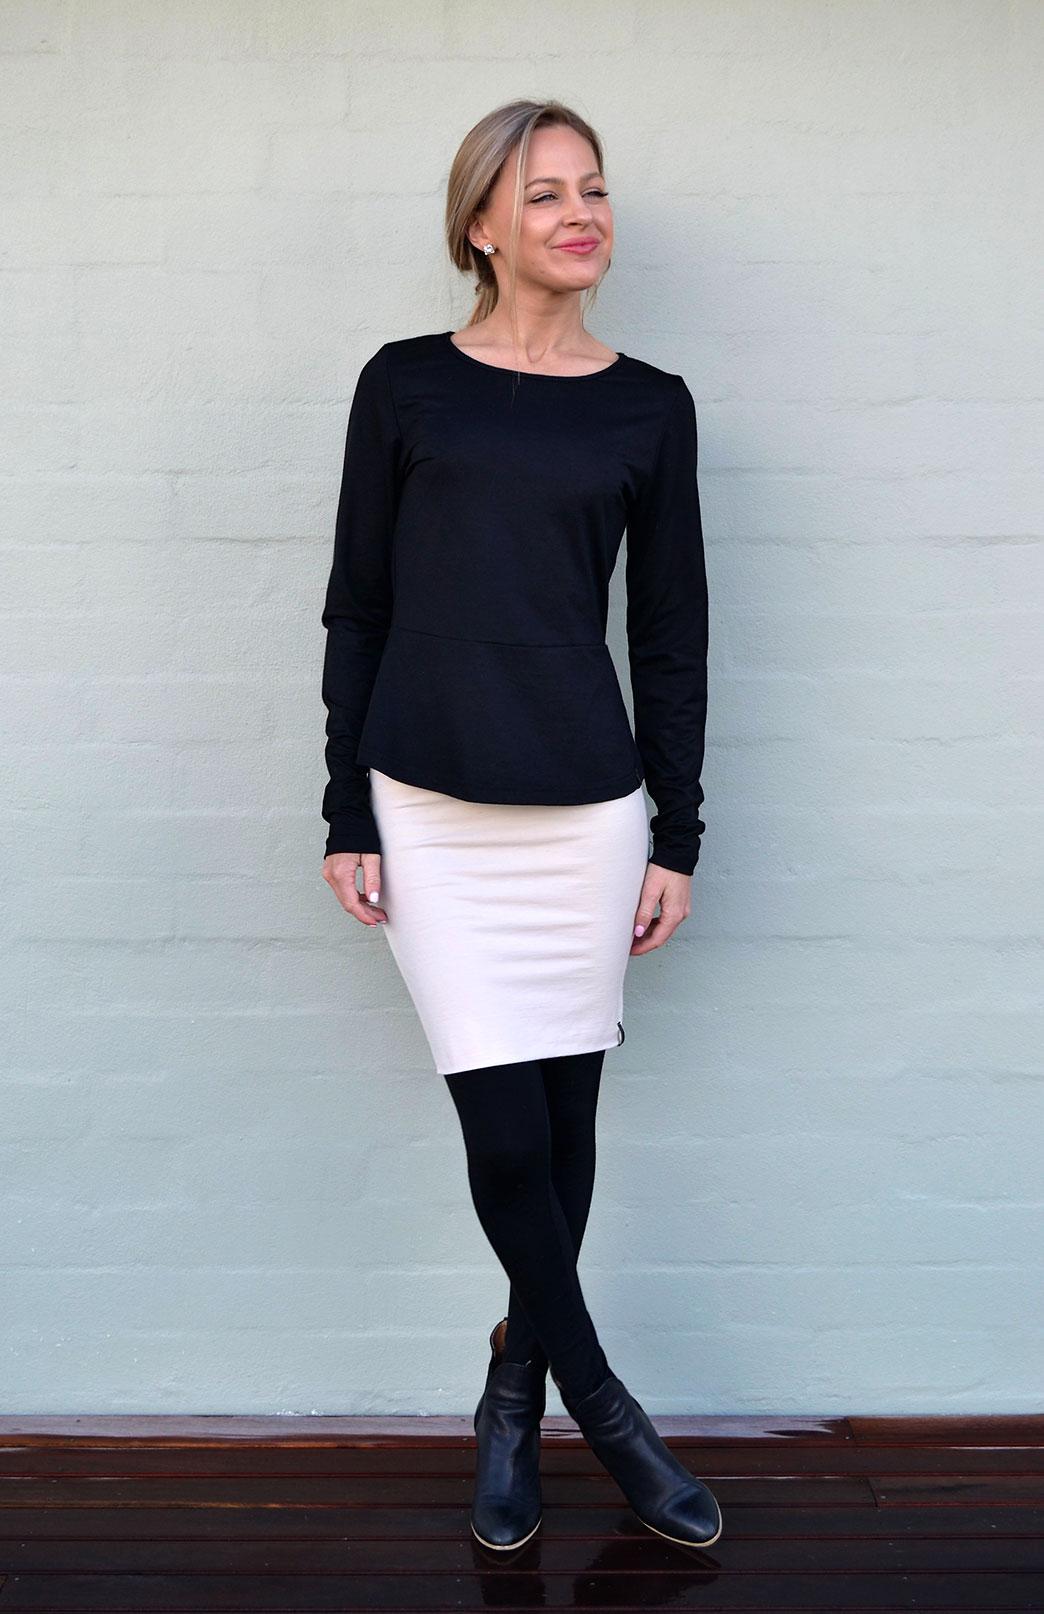 Peplum Top - Long Sleeved - Women's Black Long Sleeve Wool Winter Top - Smitten Merino Tasmania Australia